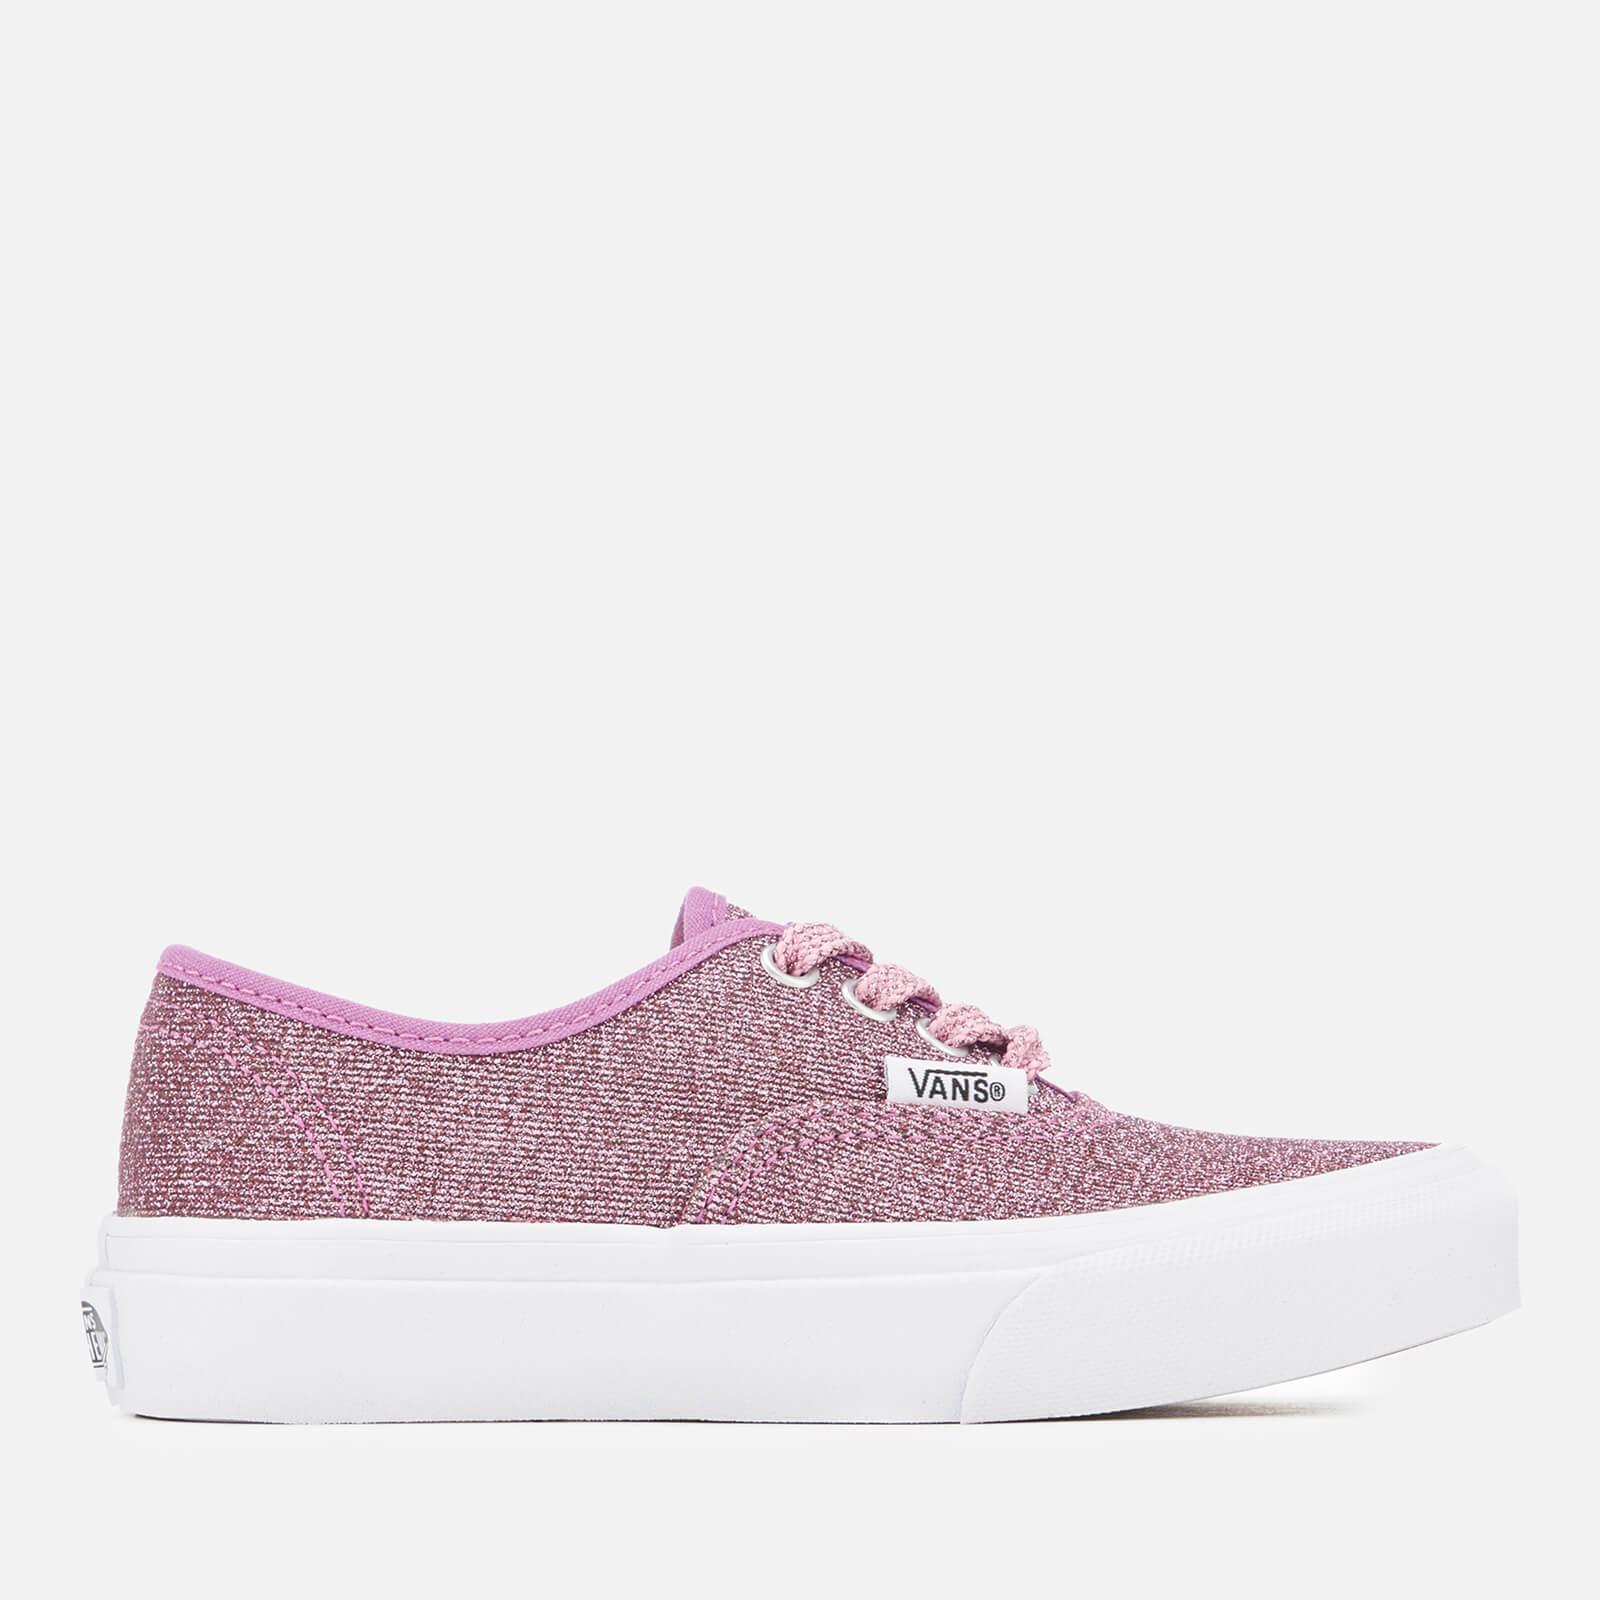 3abd1e755f Vans Kids  Authentic Lurex Glitter Trainers - Pink True White Junior ...